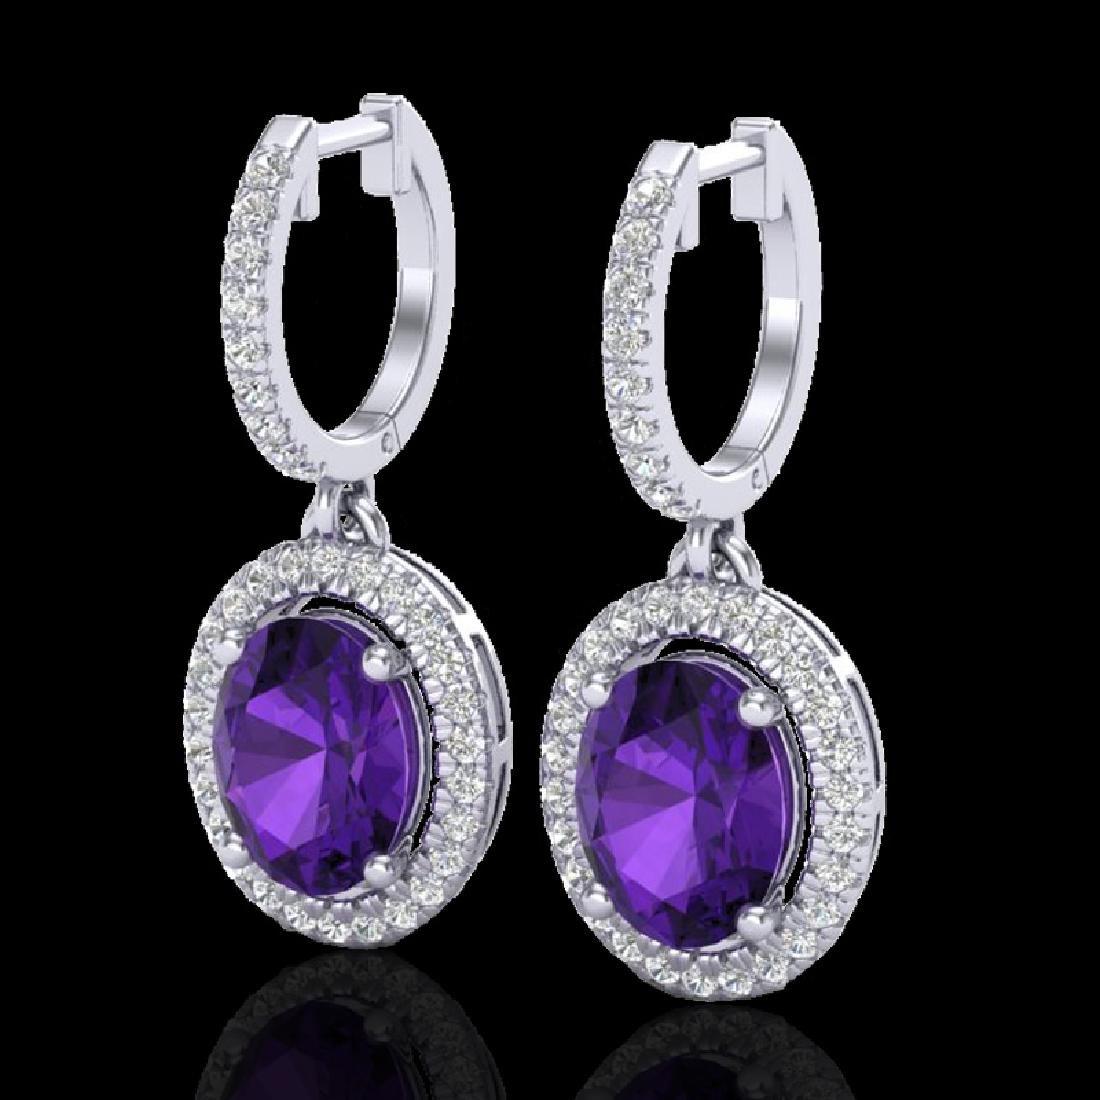 3.50 CTW Amethyst & Micro Pave VS/SI Diamond Earrings